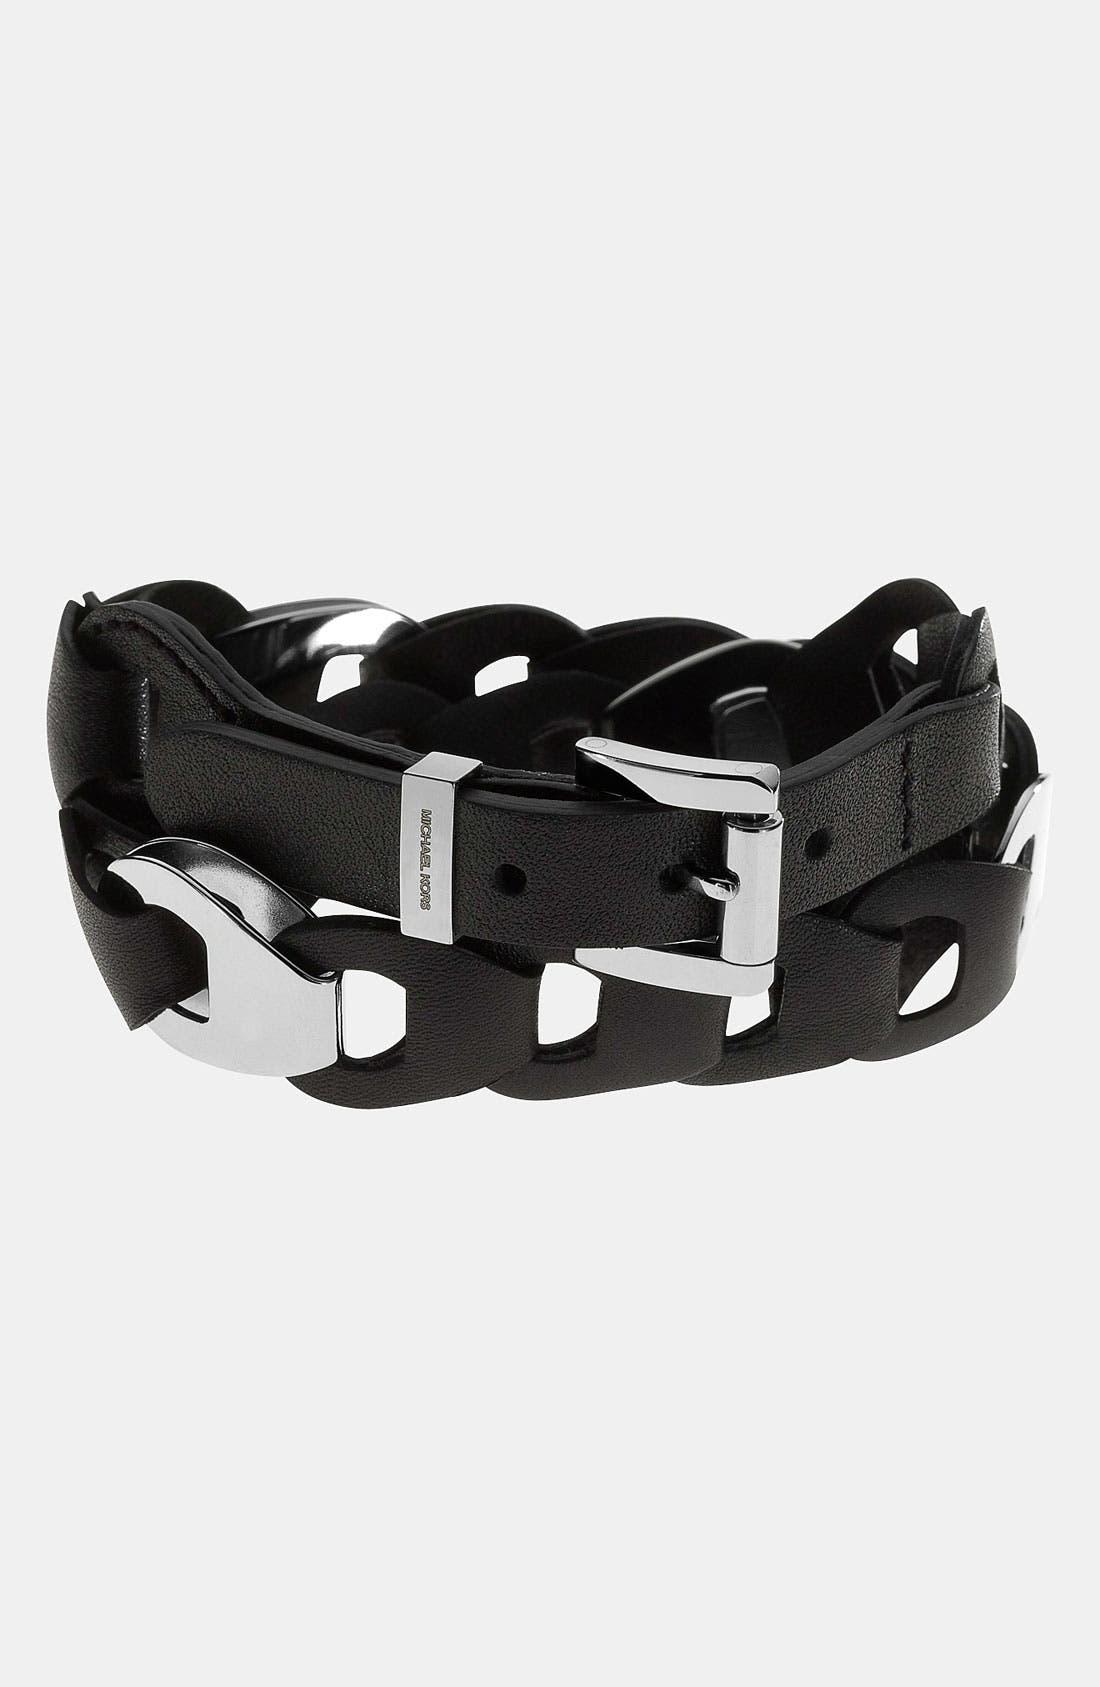 Main Image - Michael Kors 'Equestrian Luxury' Leather Wrap Bracelet